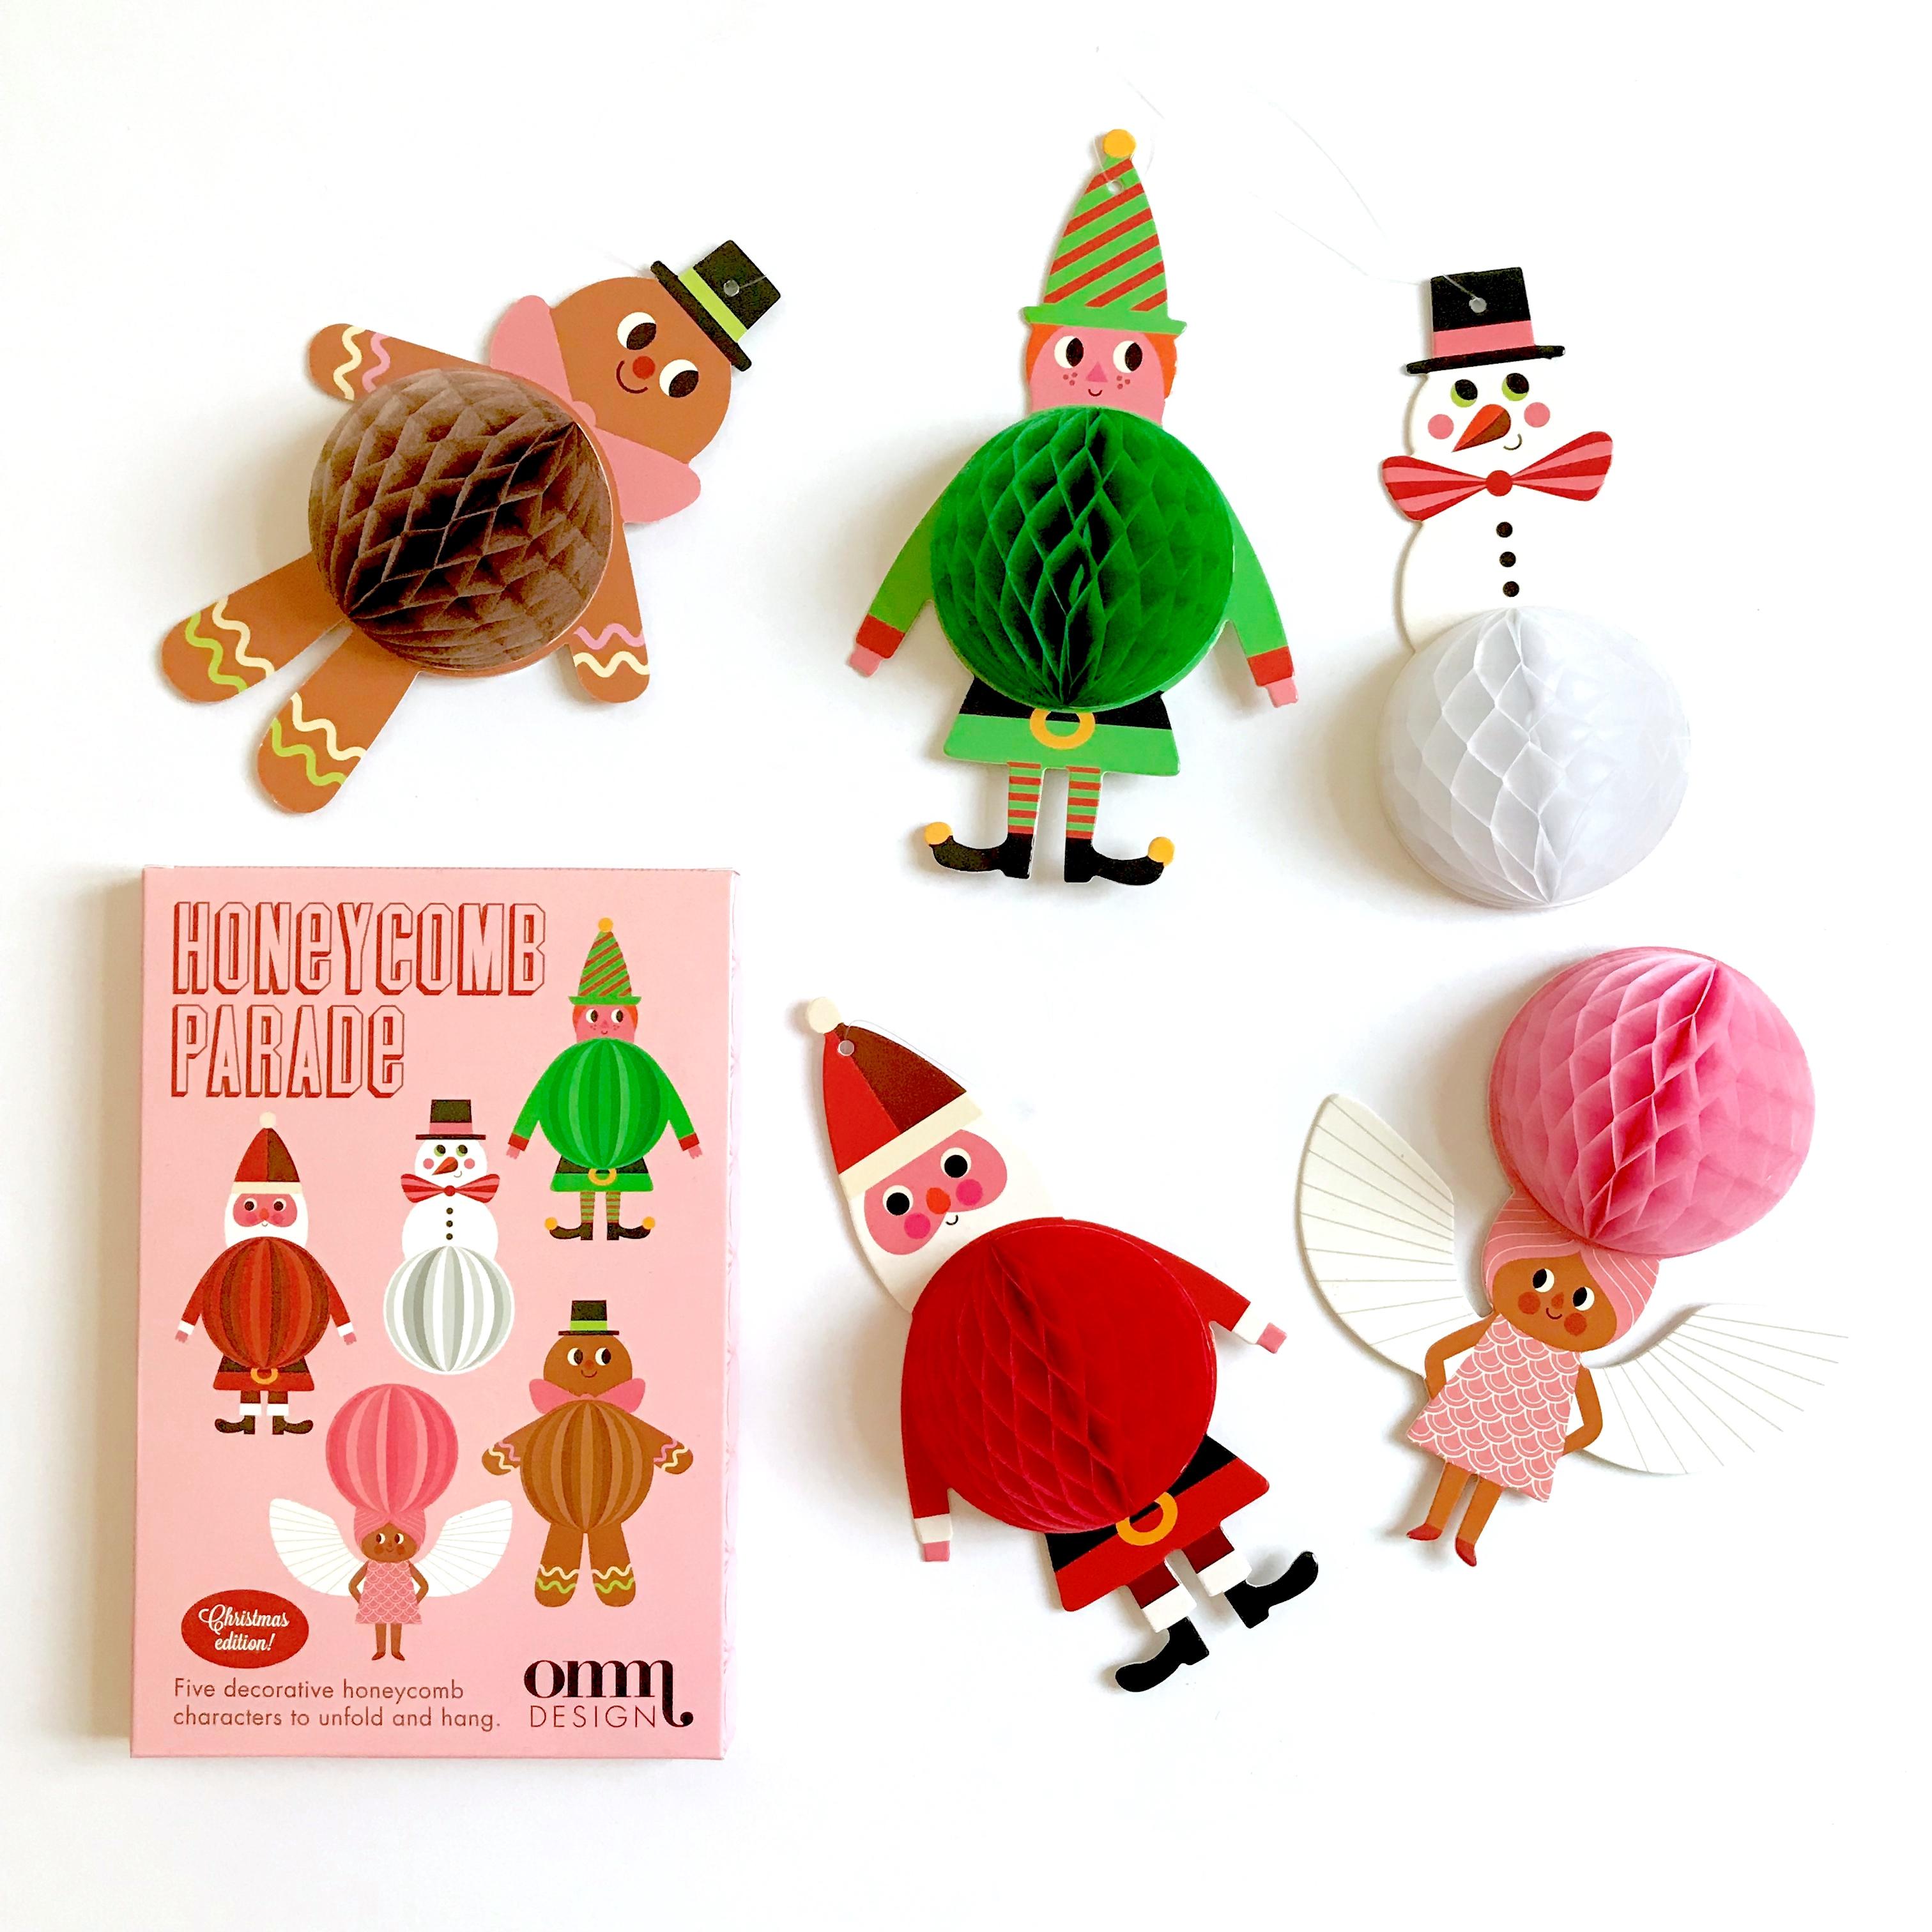 Honeycomb Parade - Christmas Edition